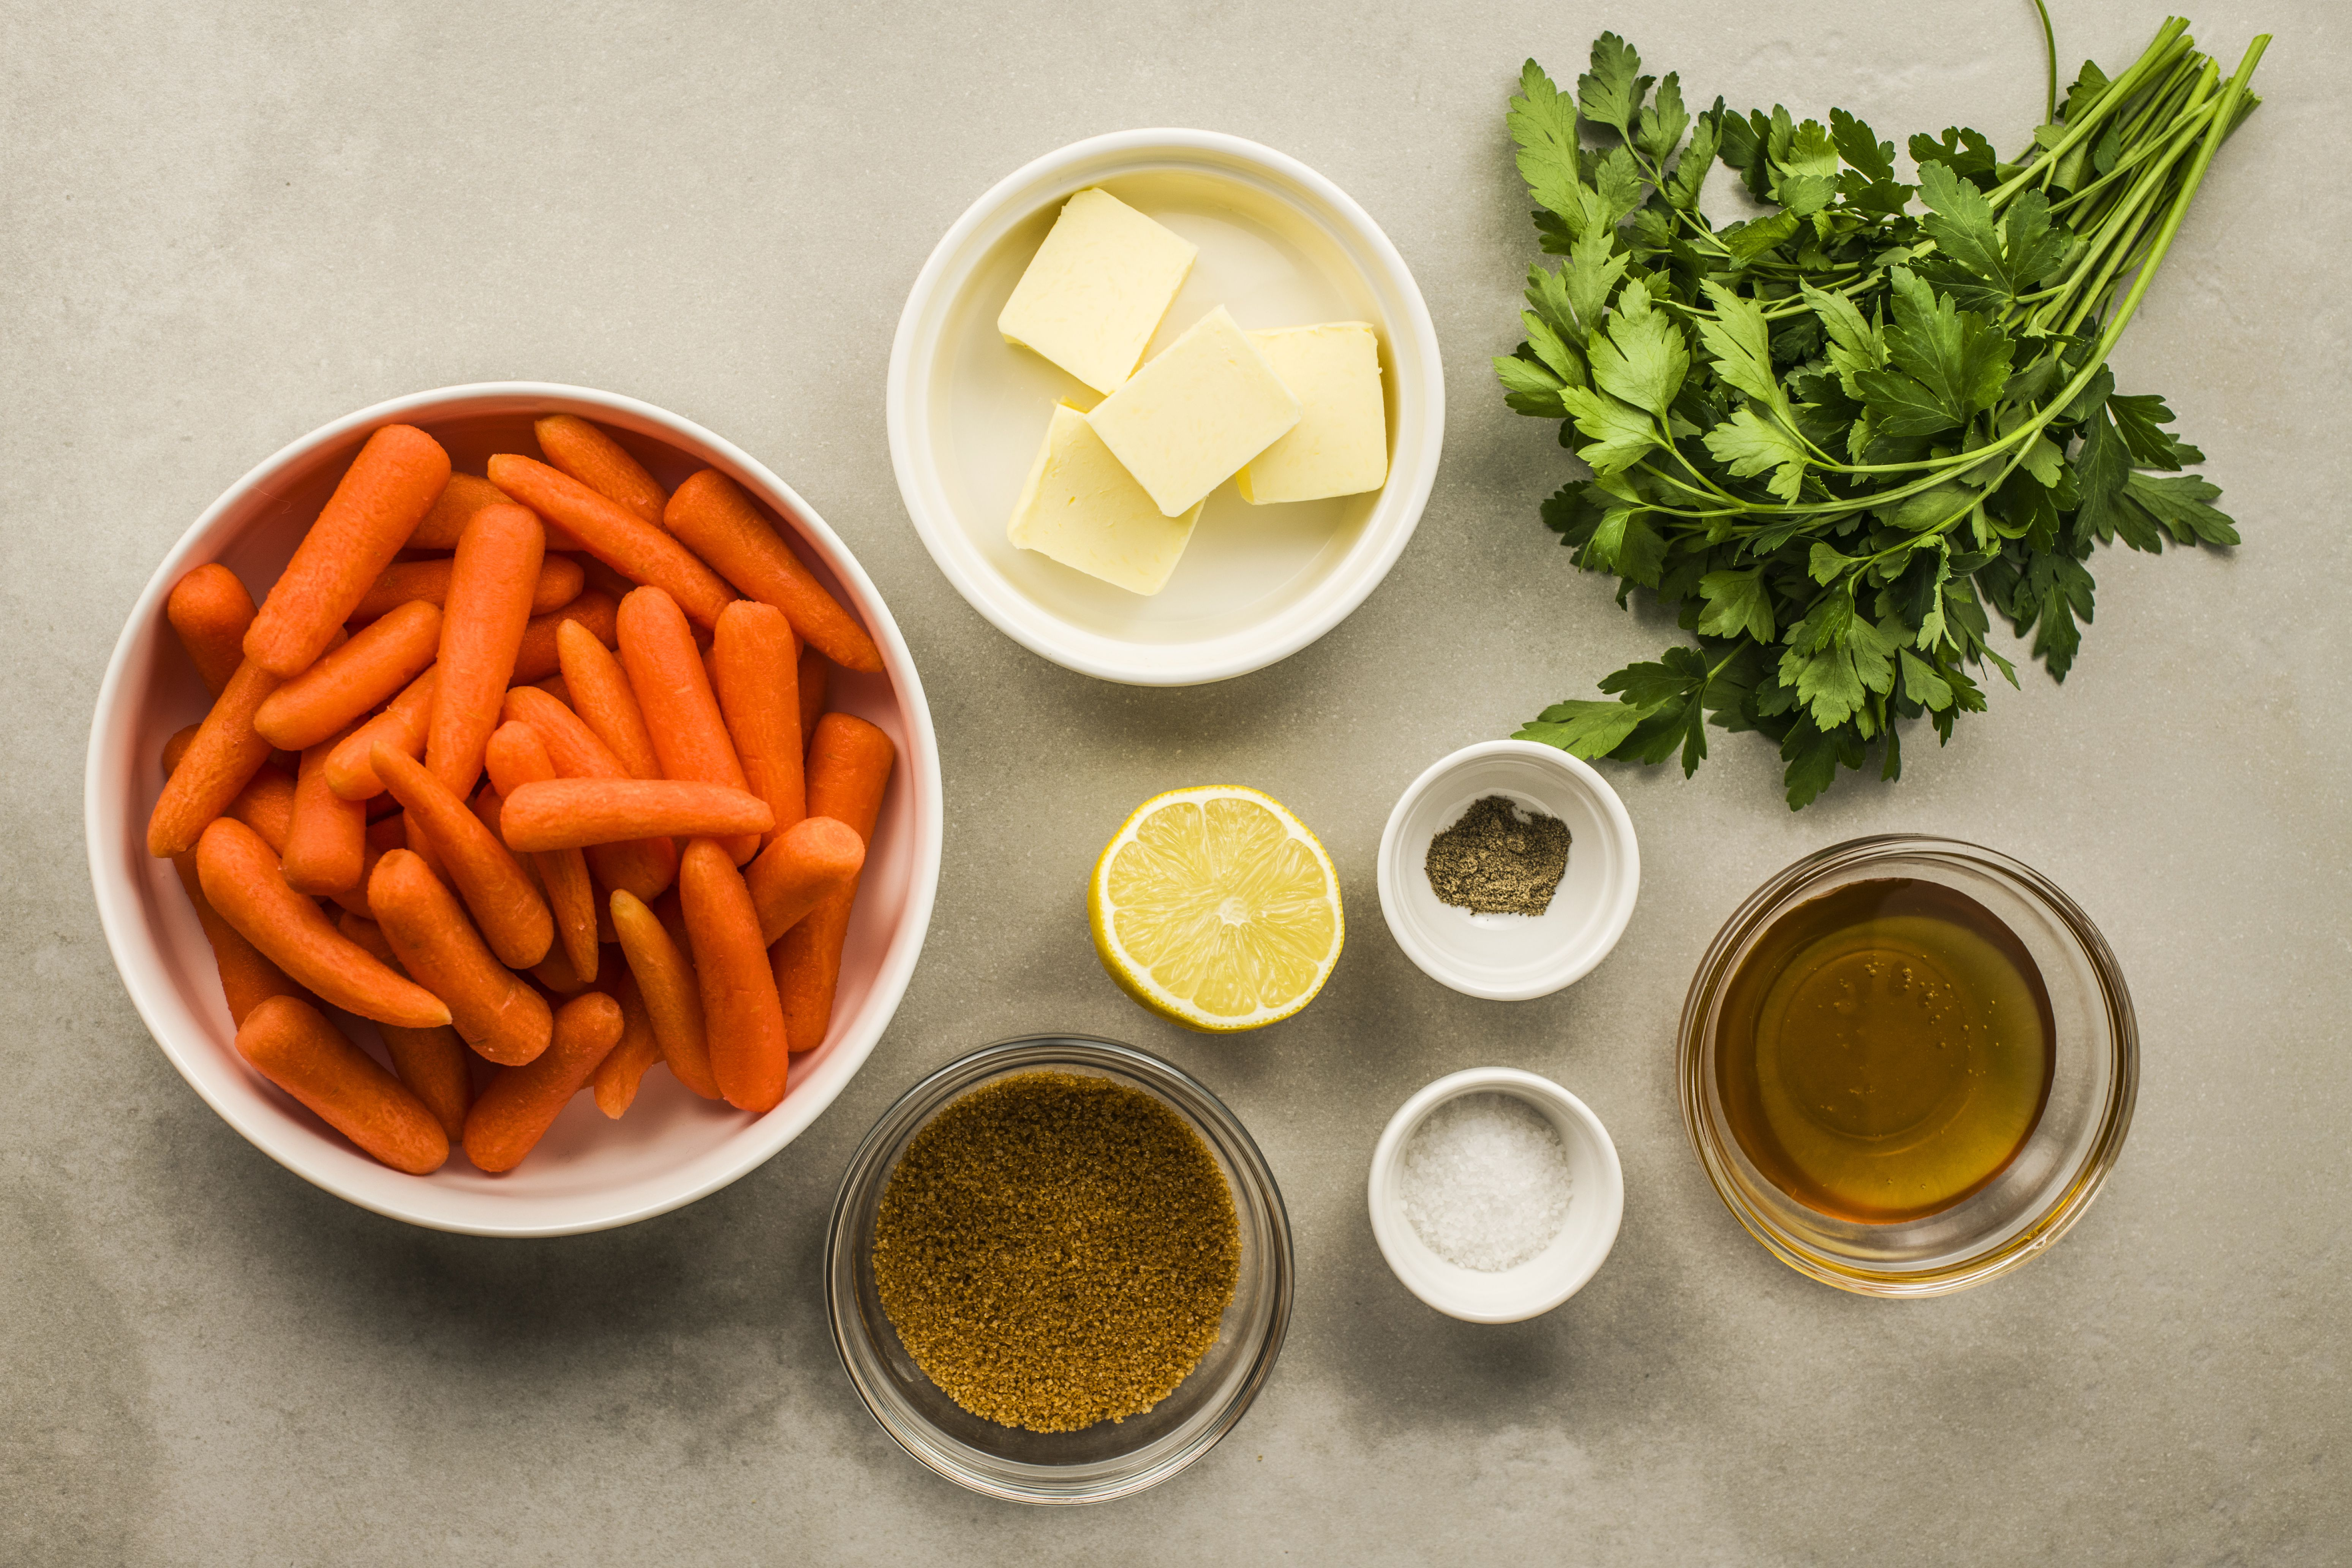 Ingredients for honey glazed baby carrots